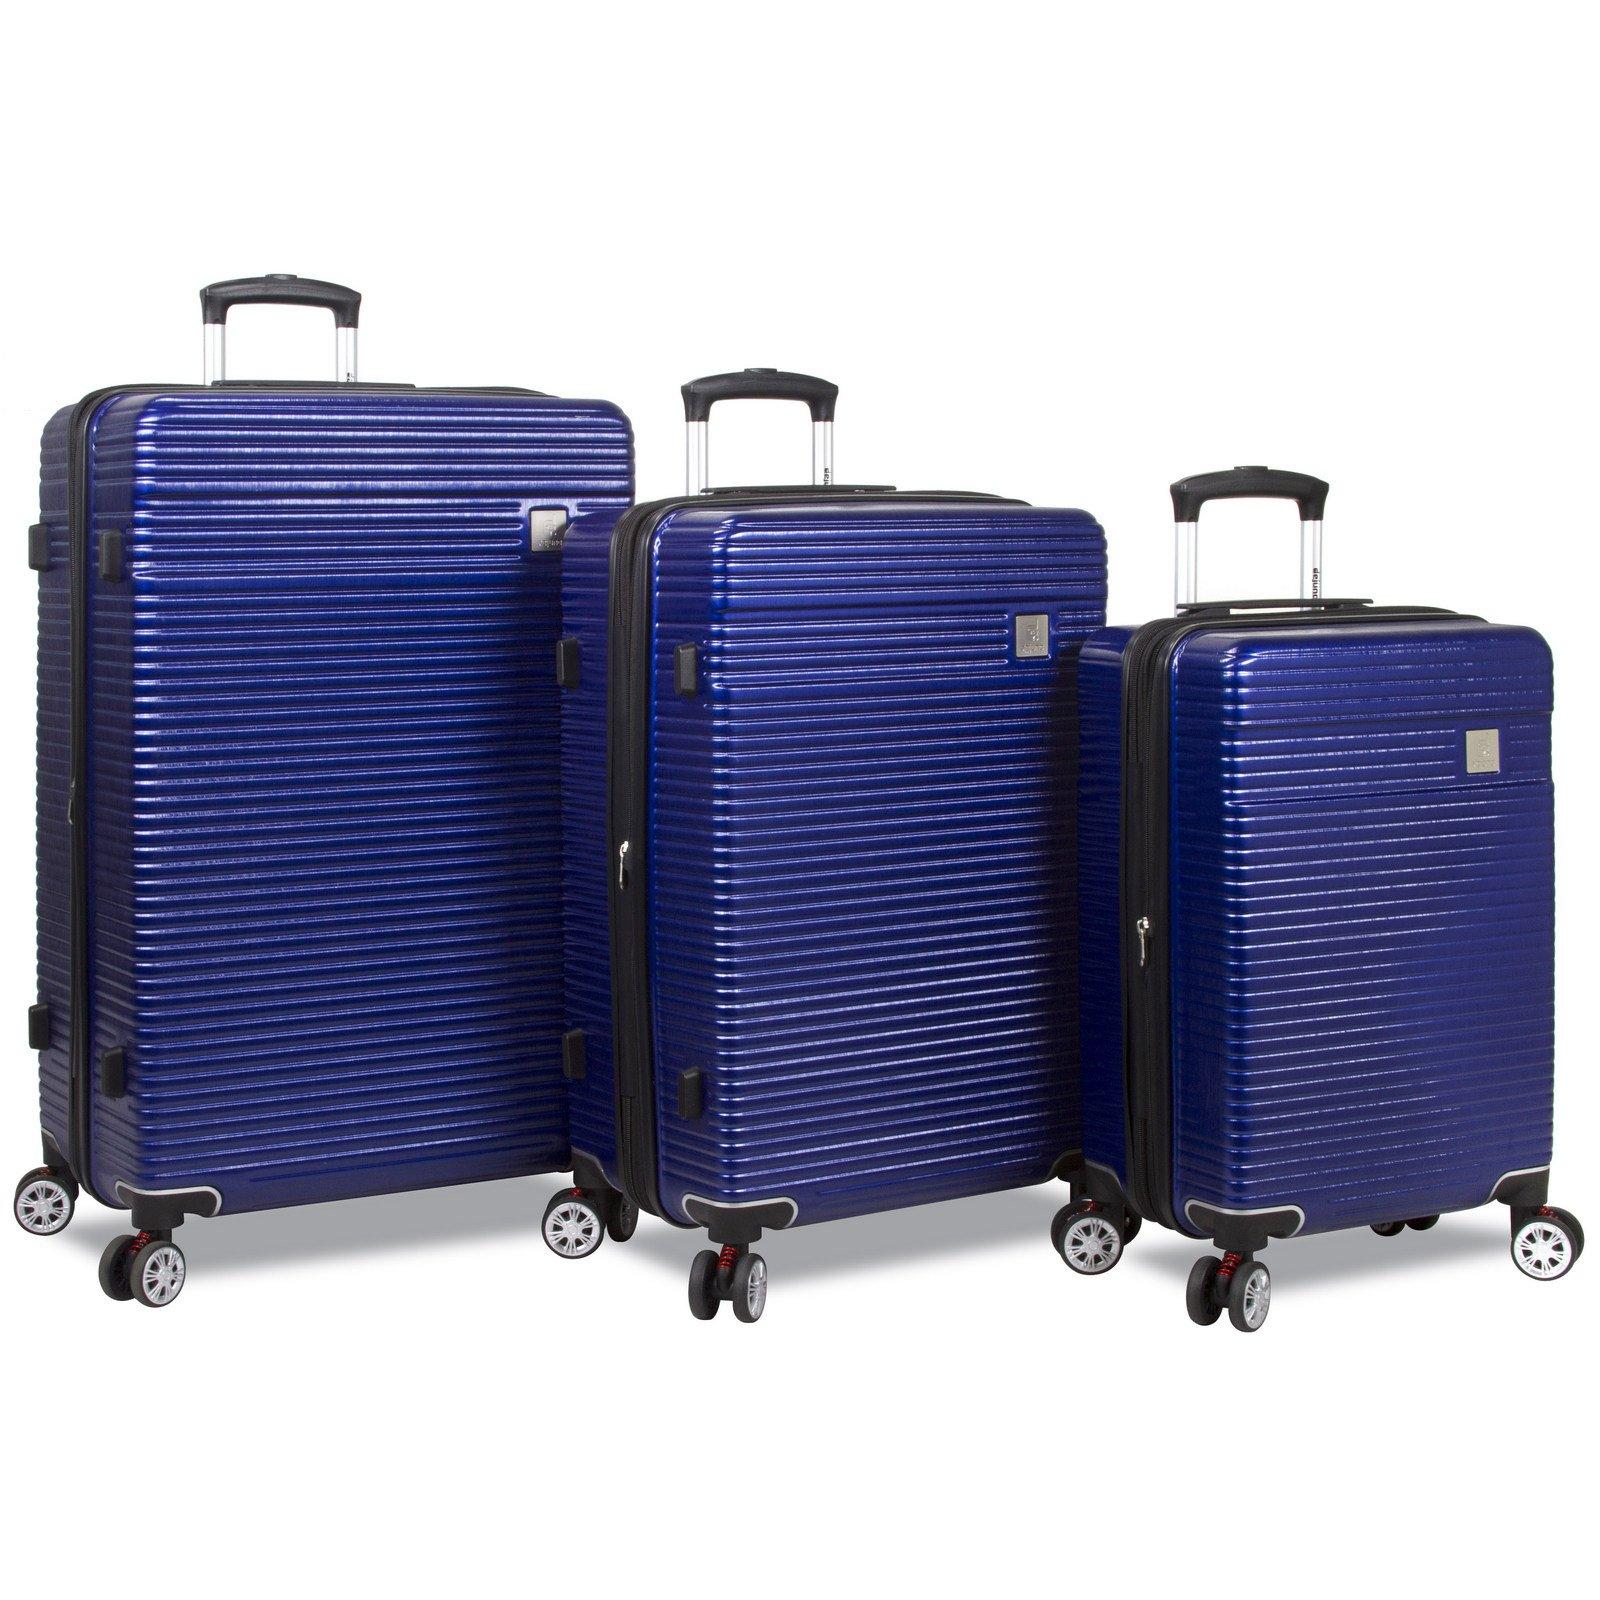 Dejuno Ashford 3-pc Hardside Spinner TSA Combination Lock Luggage Set-Navy by Dejuno